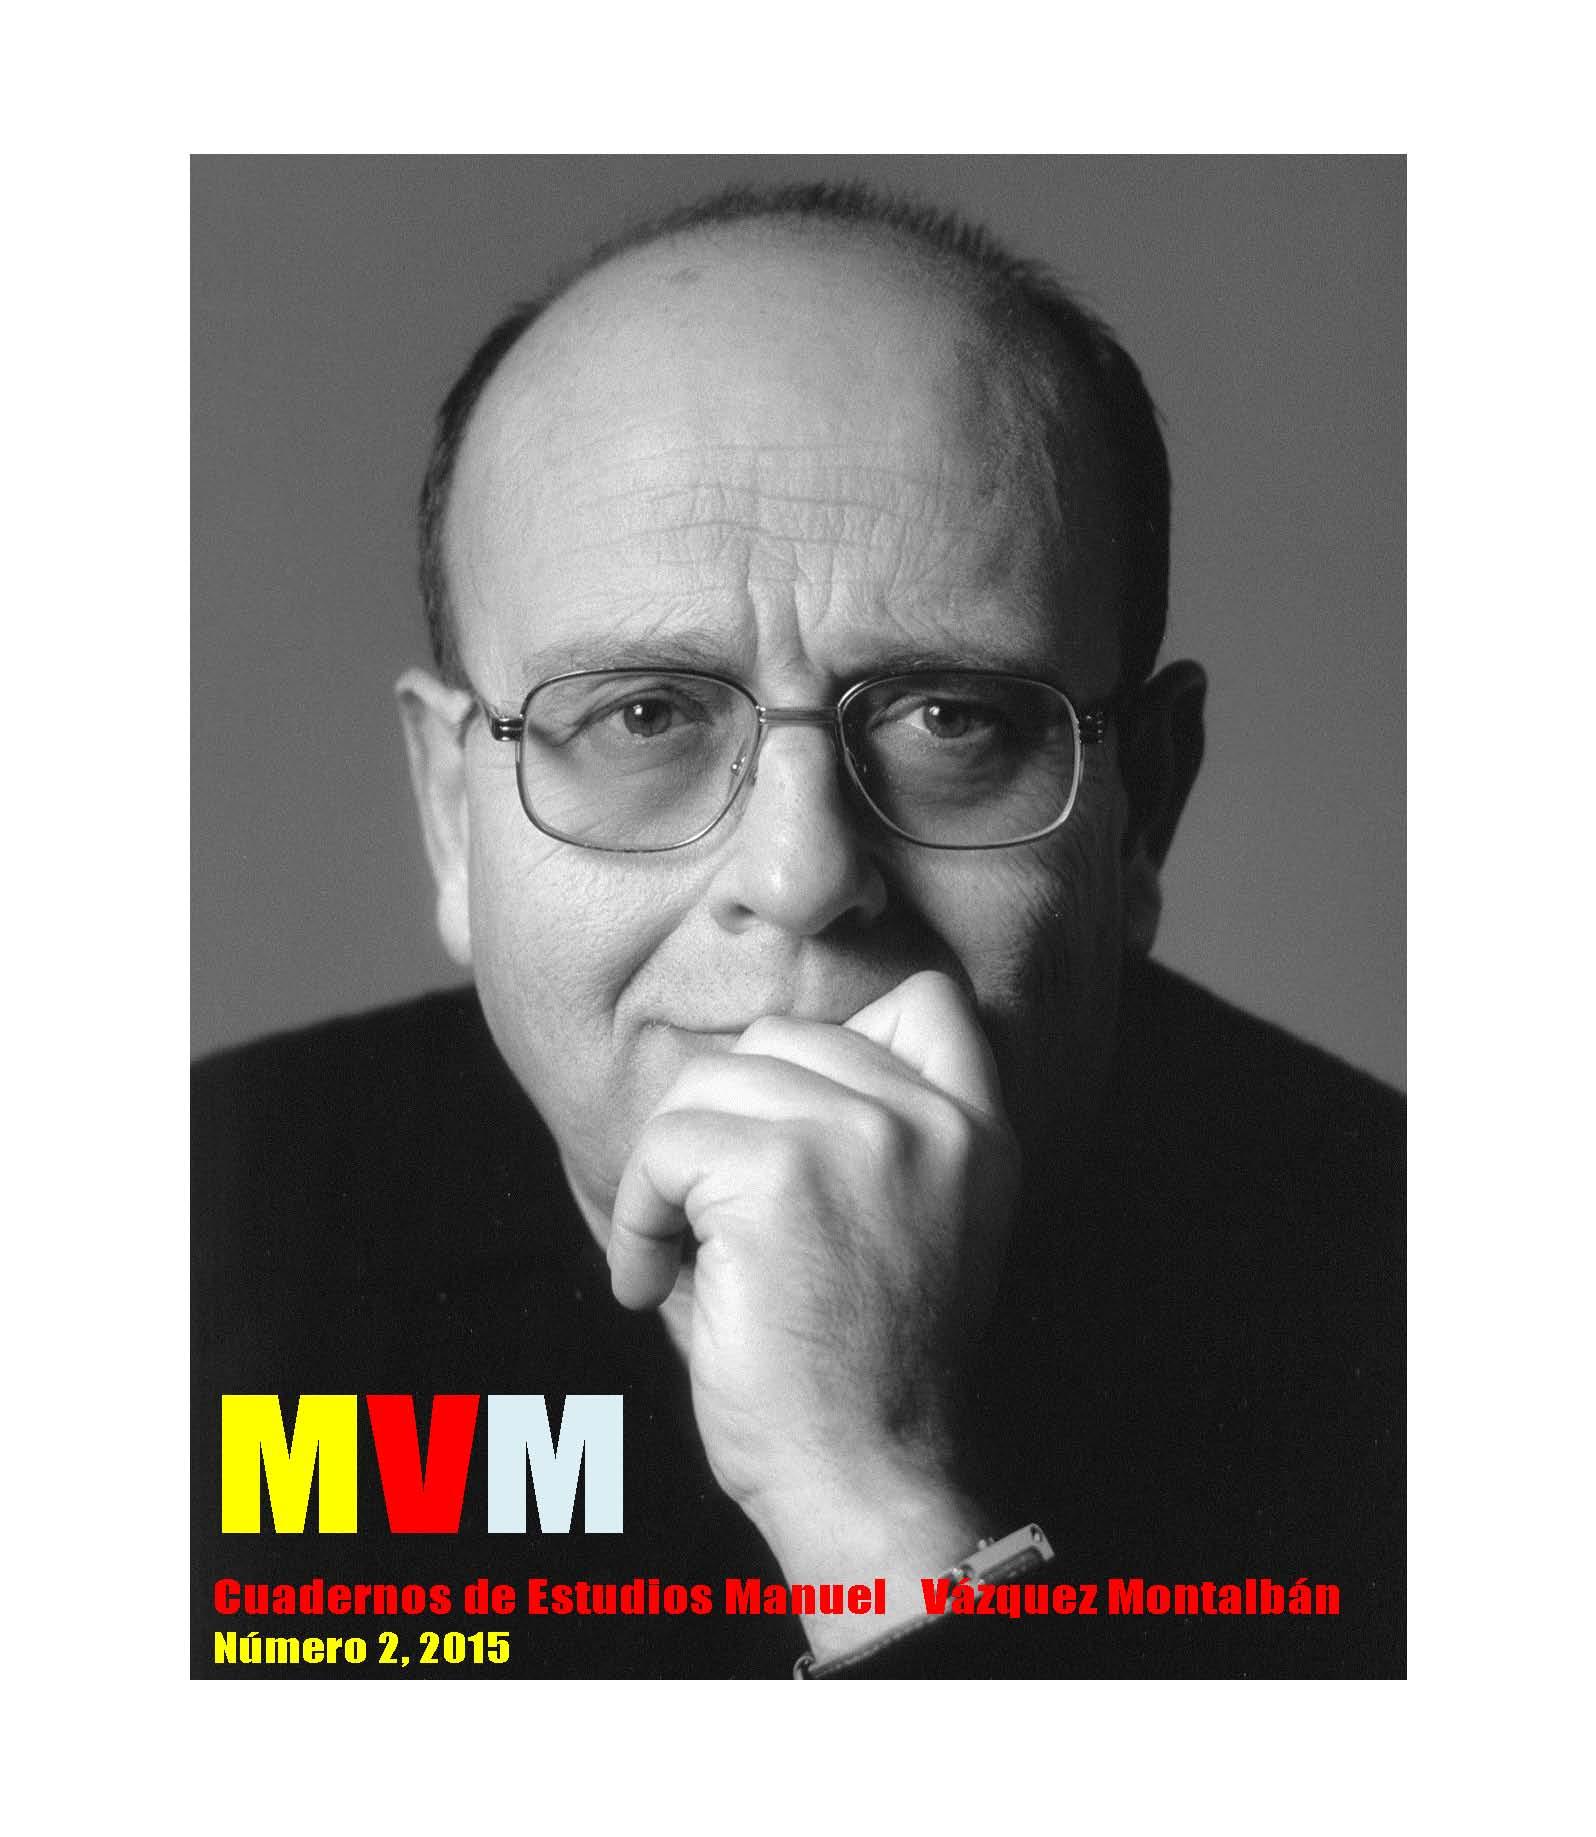 Ver Vol. 2 Núm. 1 (2015): MVM: Cuadernos de Estudios Manuel Vázquez Montalbán